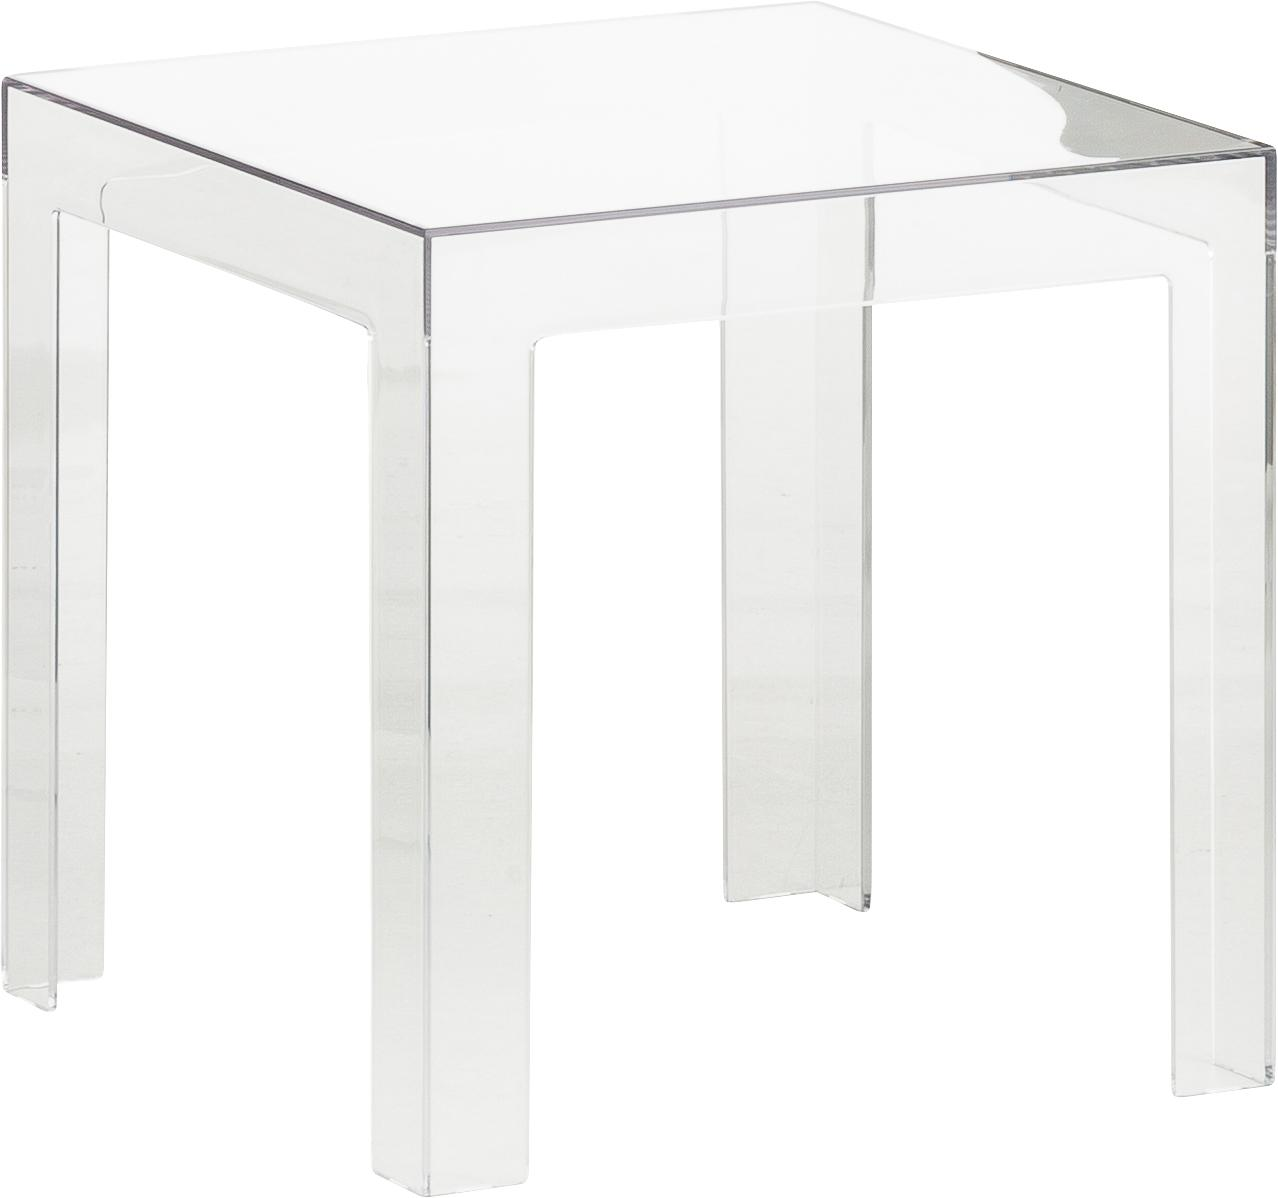 Transparante bijzettafel Jolly, Polycarbonaat, Transparant, 40 x 40 cm